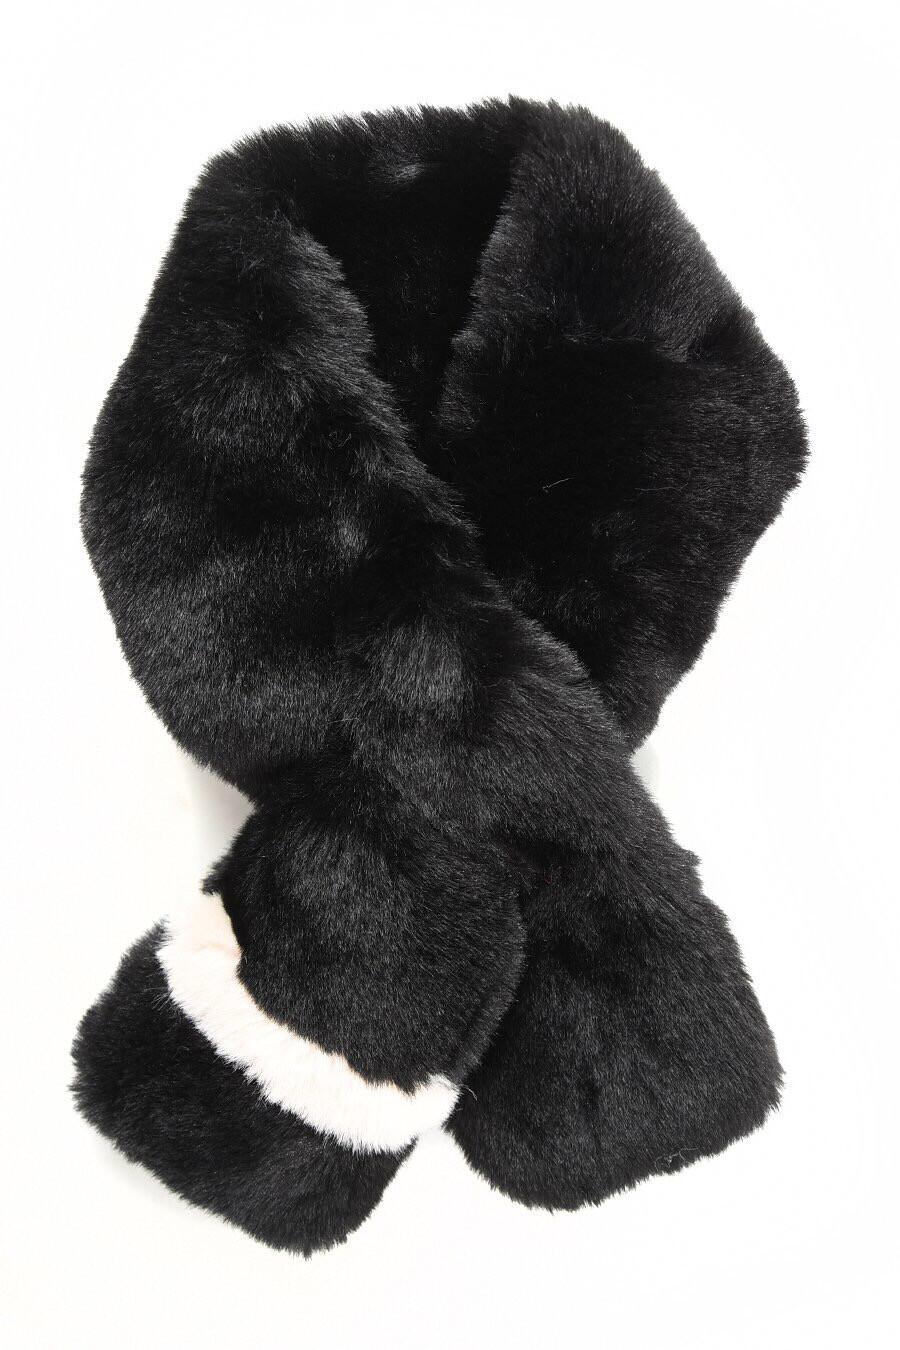 Black Faux Fur Collar With Cream Stripe